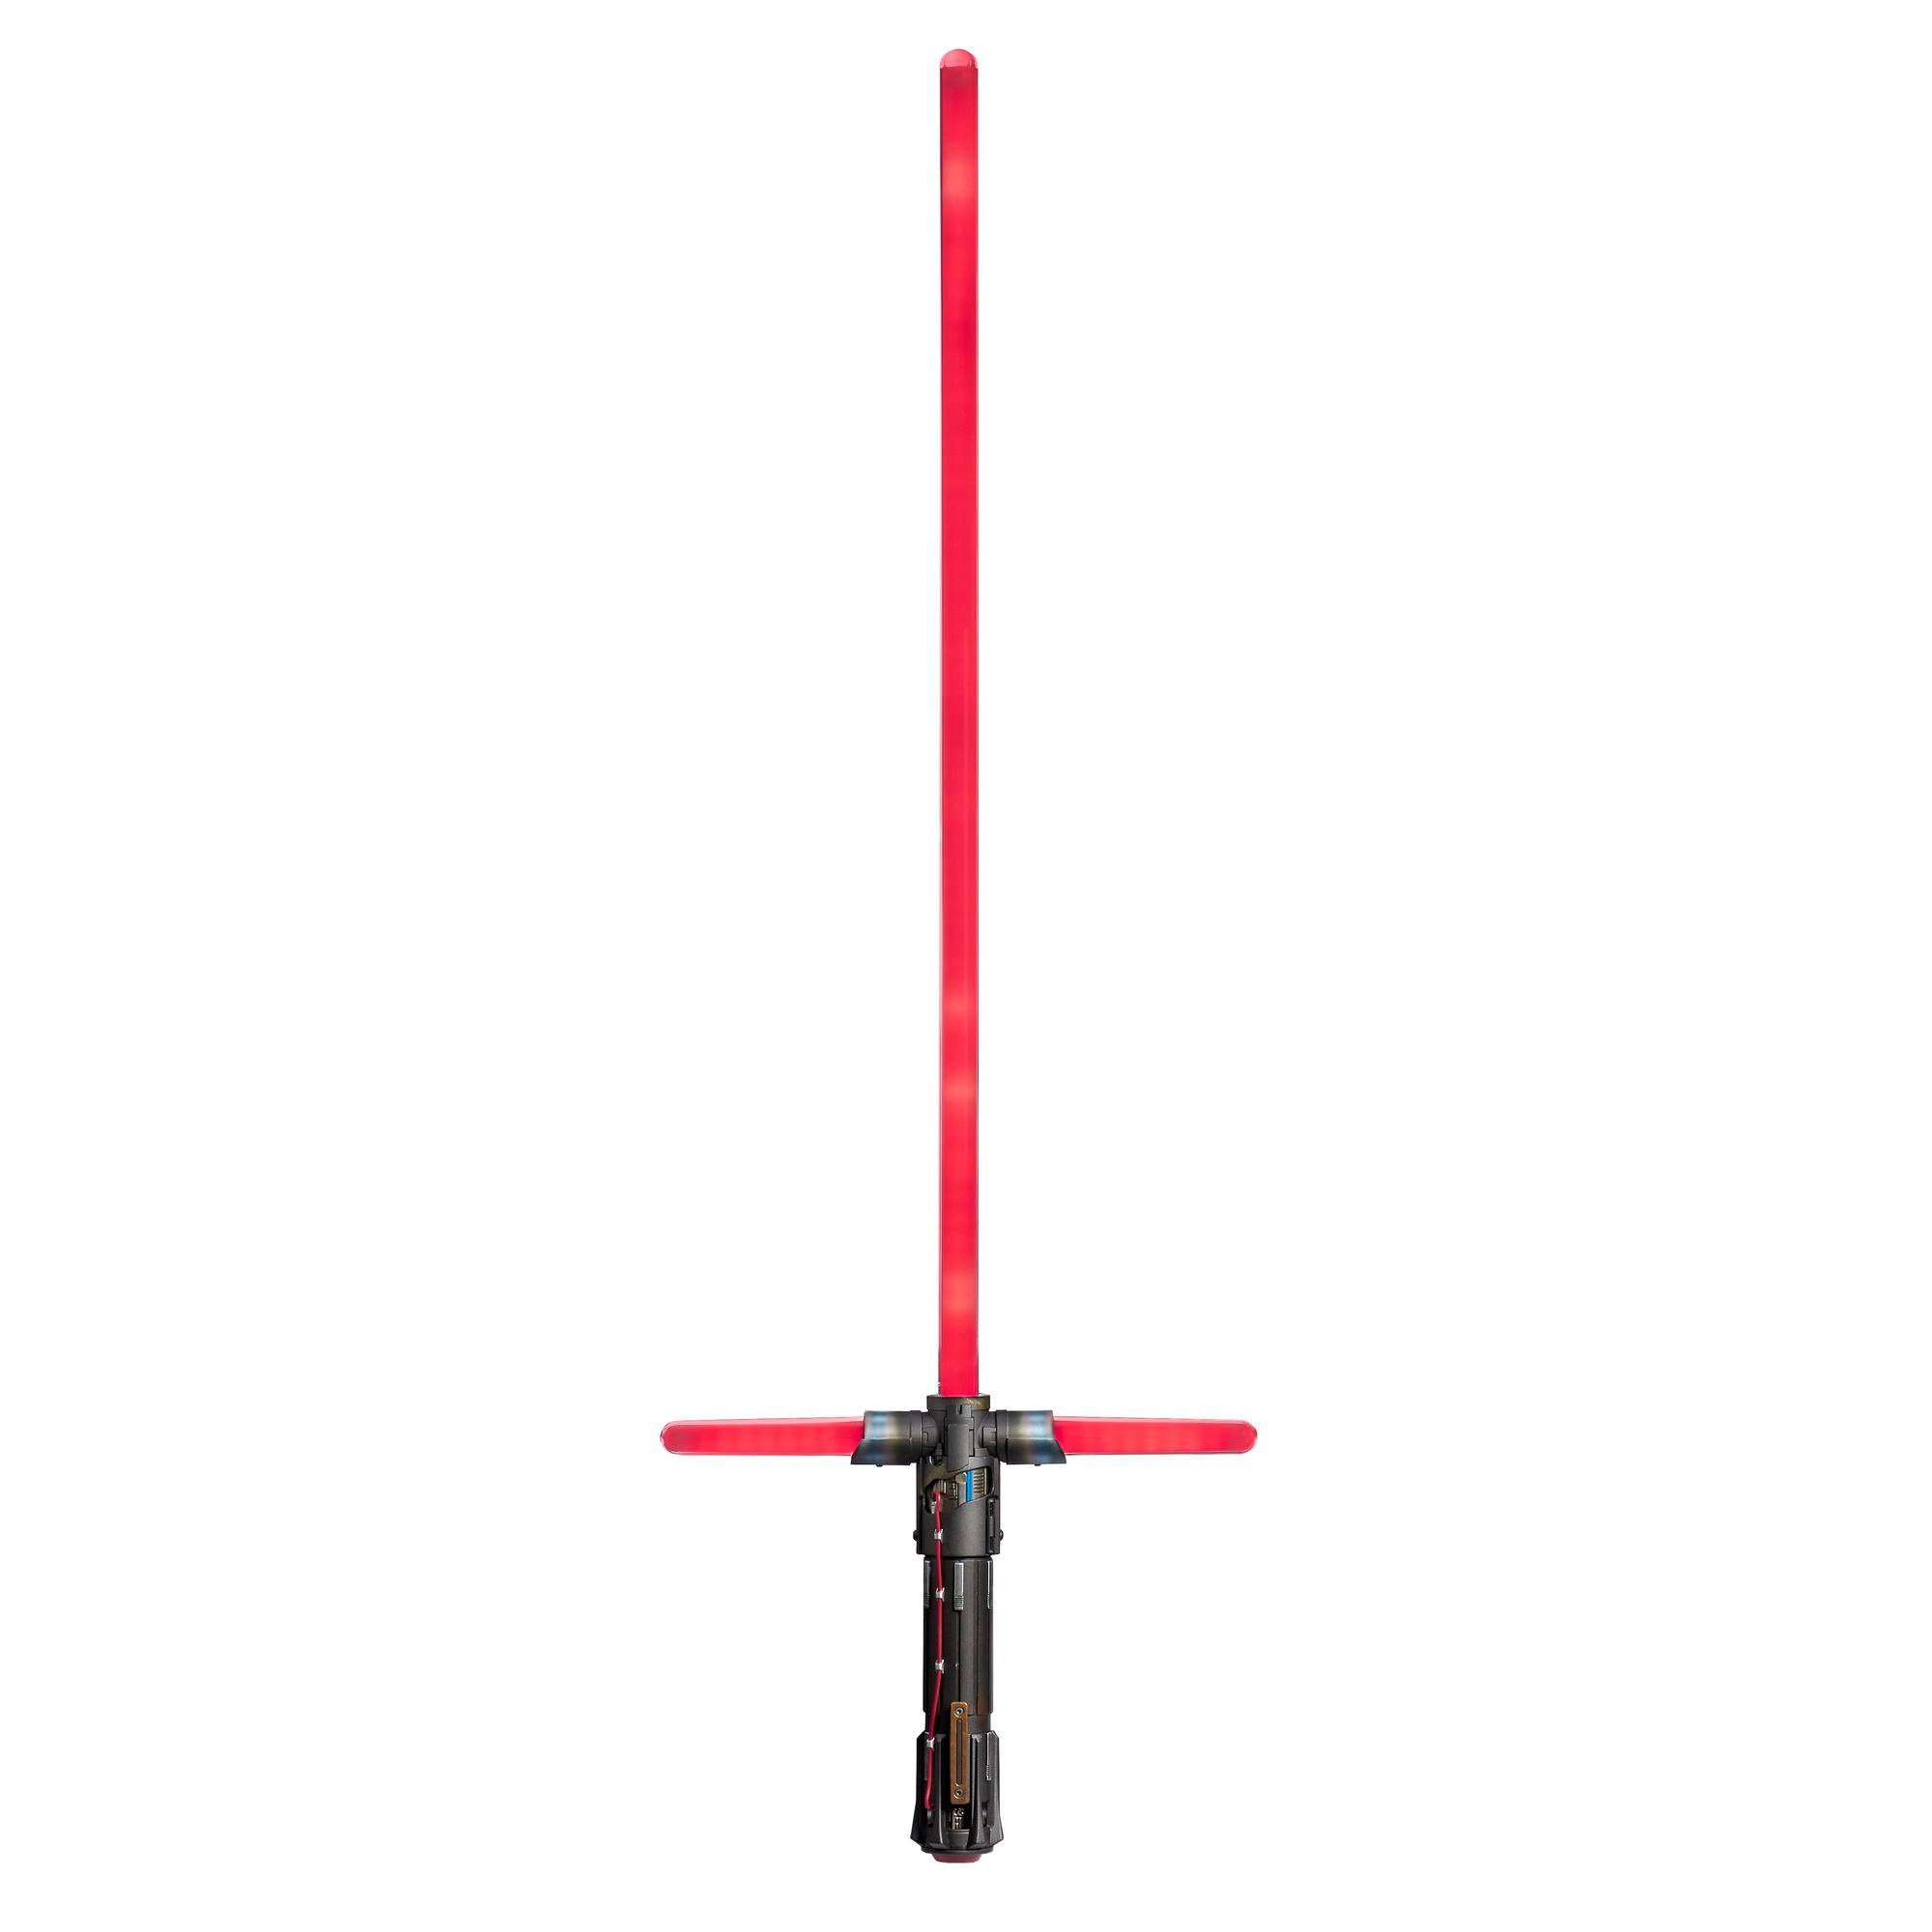 Star Wars The Black Series Supreme Leader Kylo Ren Force FX Elite Lightsaber with Advanced LED, Sound Effects